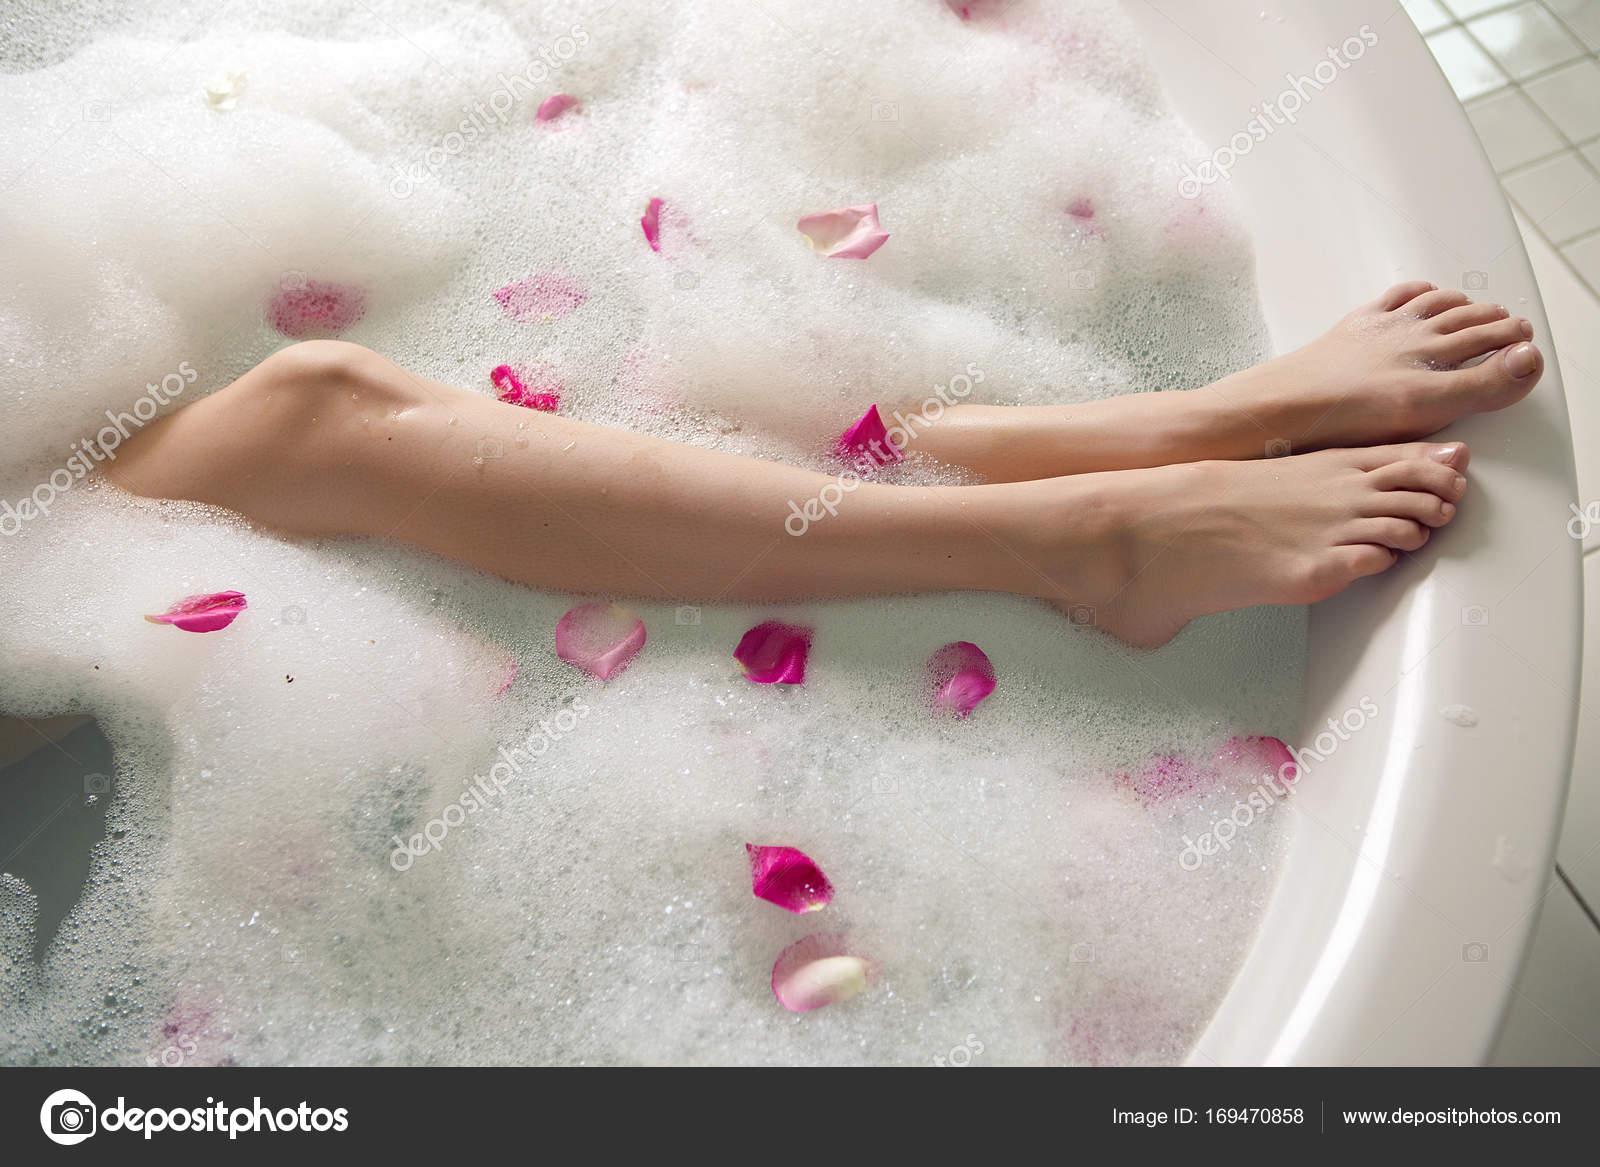 ===Palíndromos=== Depositphotos_169470858-stock-photo-pink-rose-petals-in-a